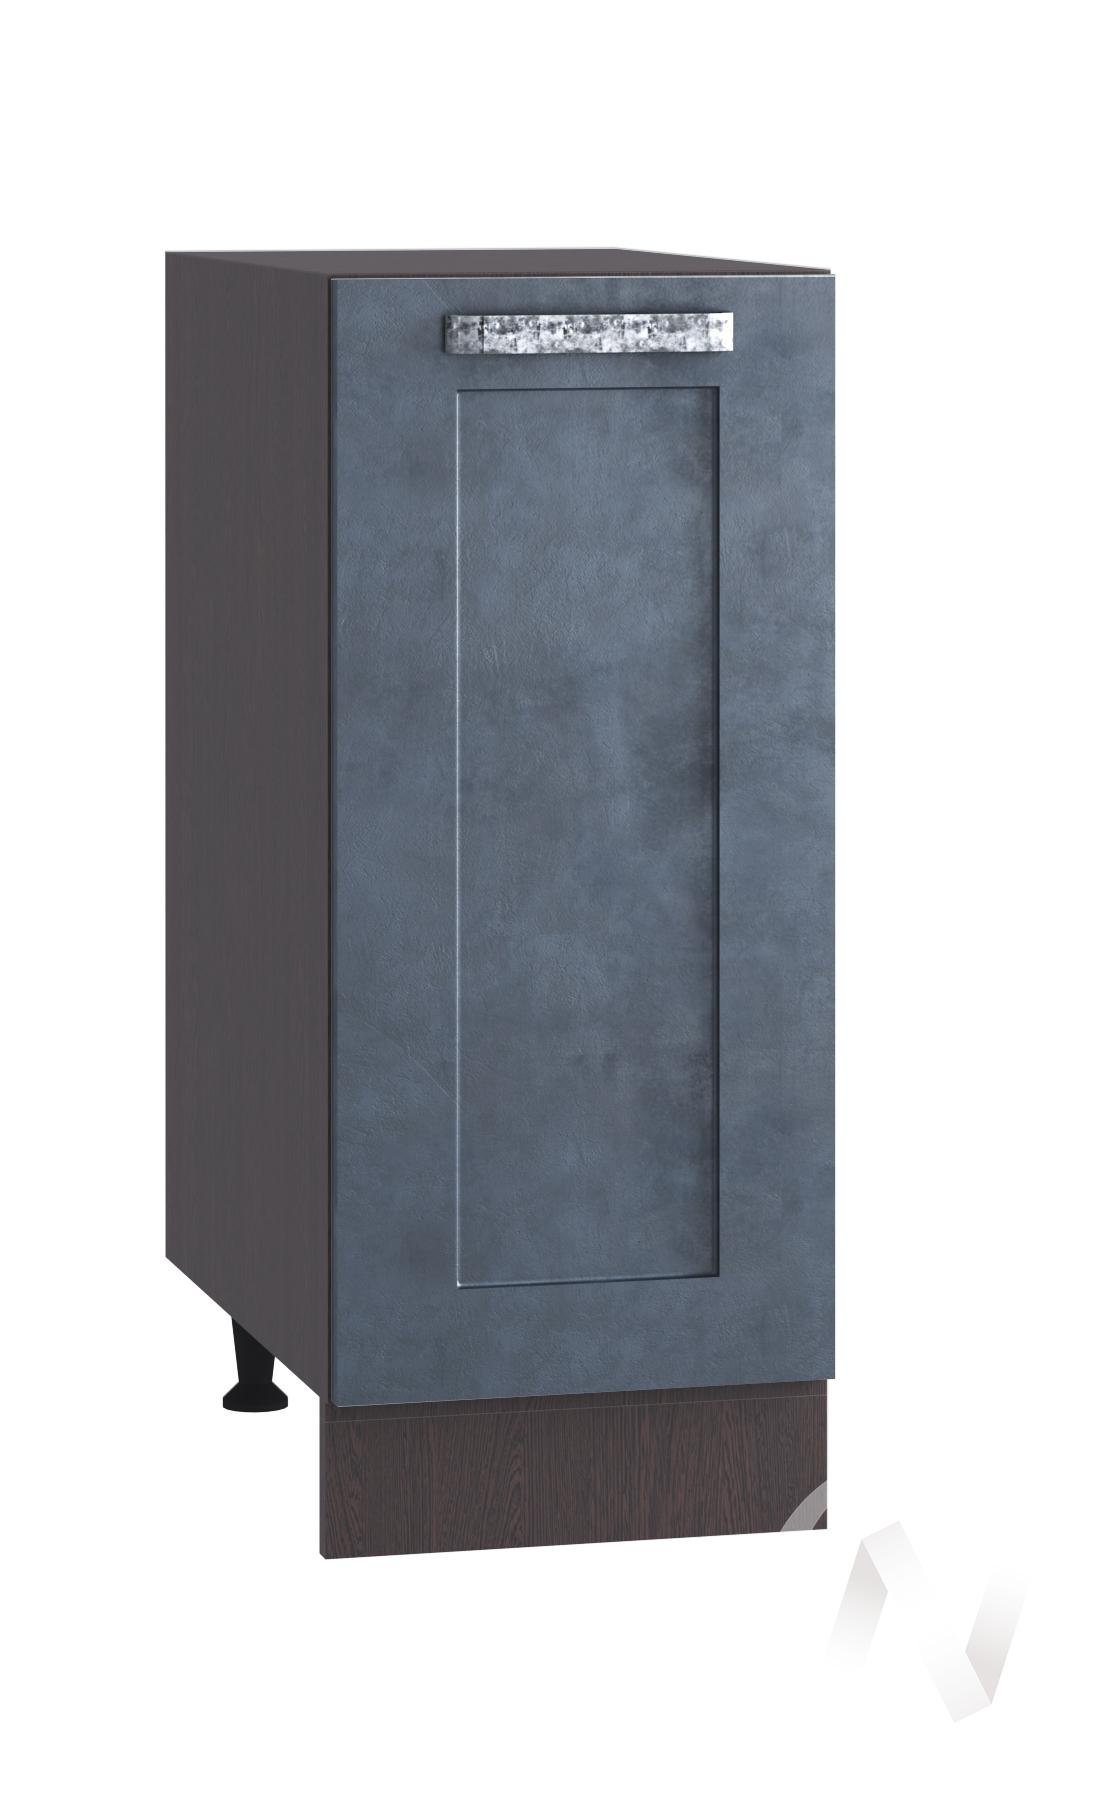 "Кухня ""Лофт"": Шкаф нижний 300, ШН 300 (Бетон графит/корпус венге)"